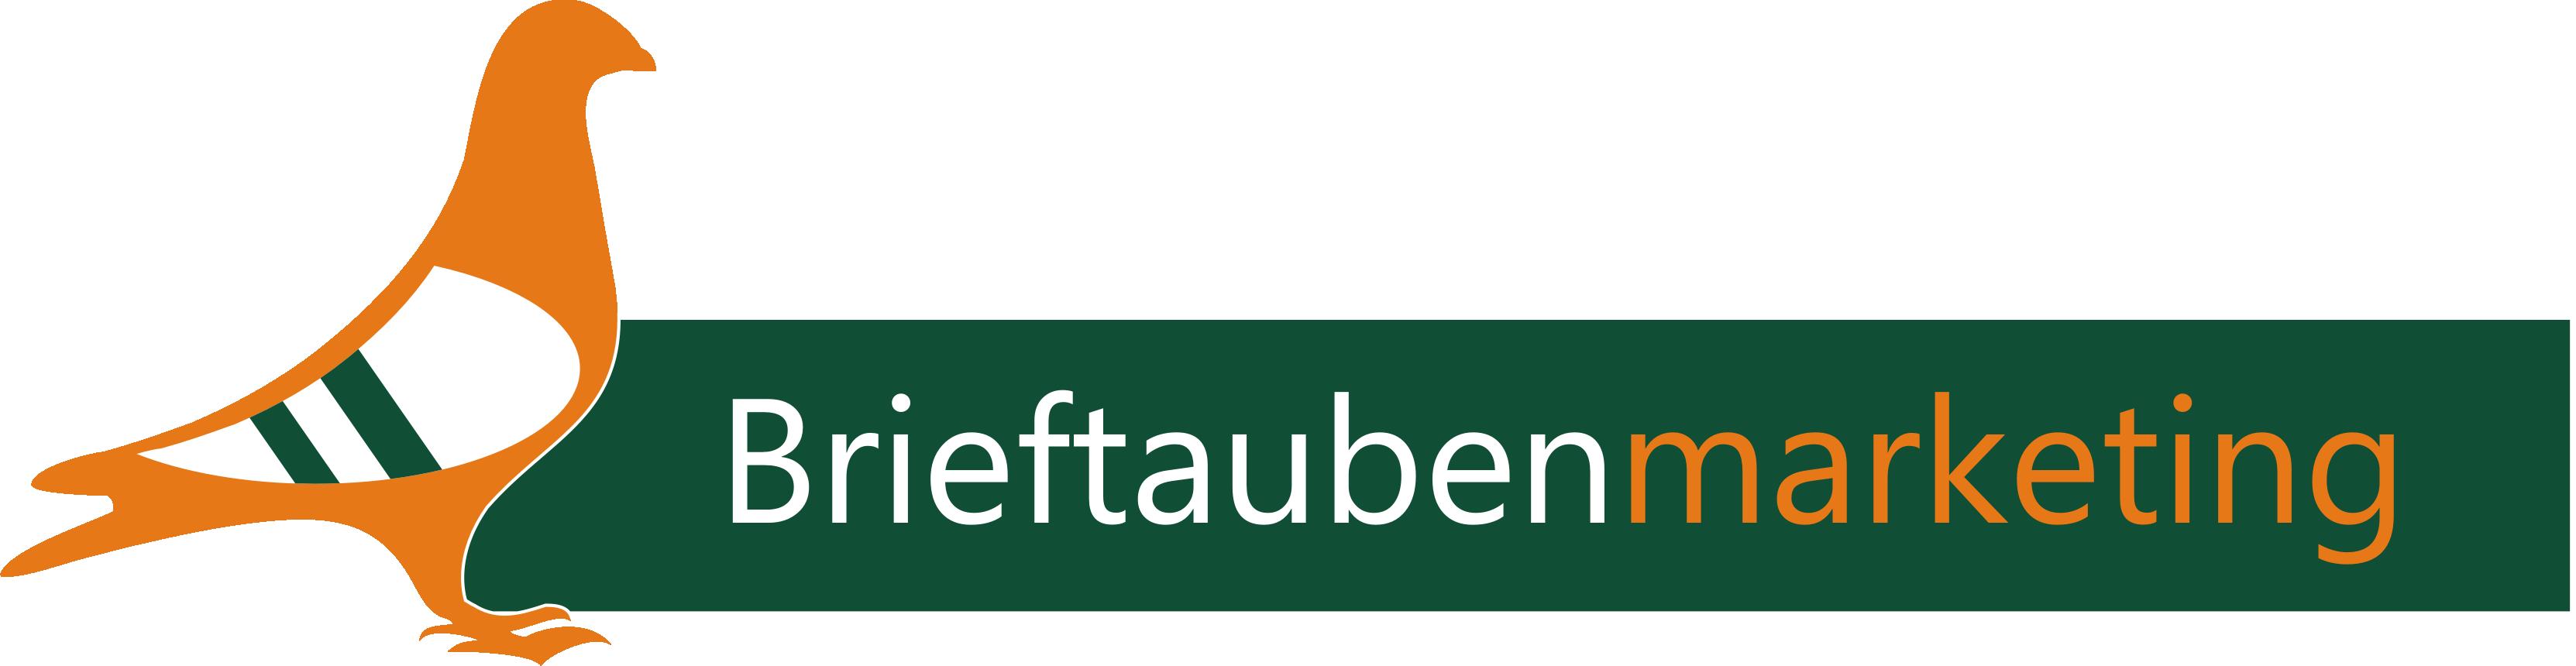 Naumann-Logomarketing.png - 97,22 kB